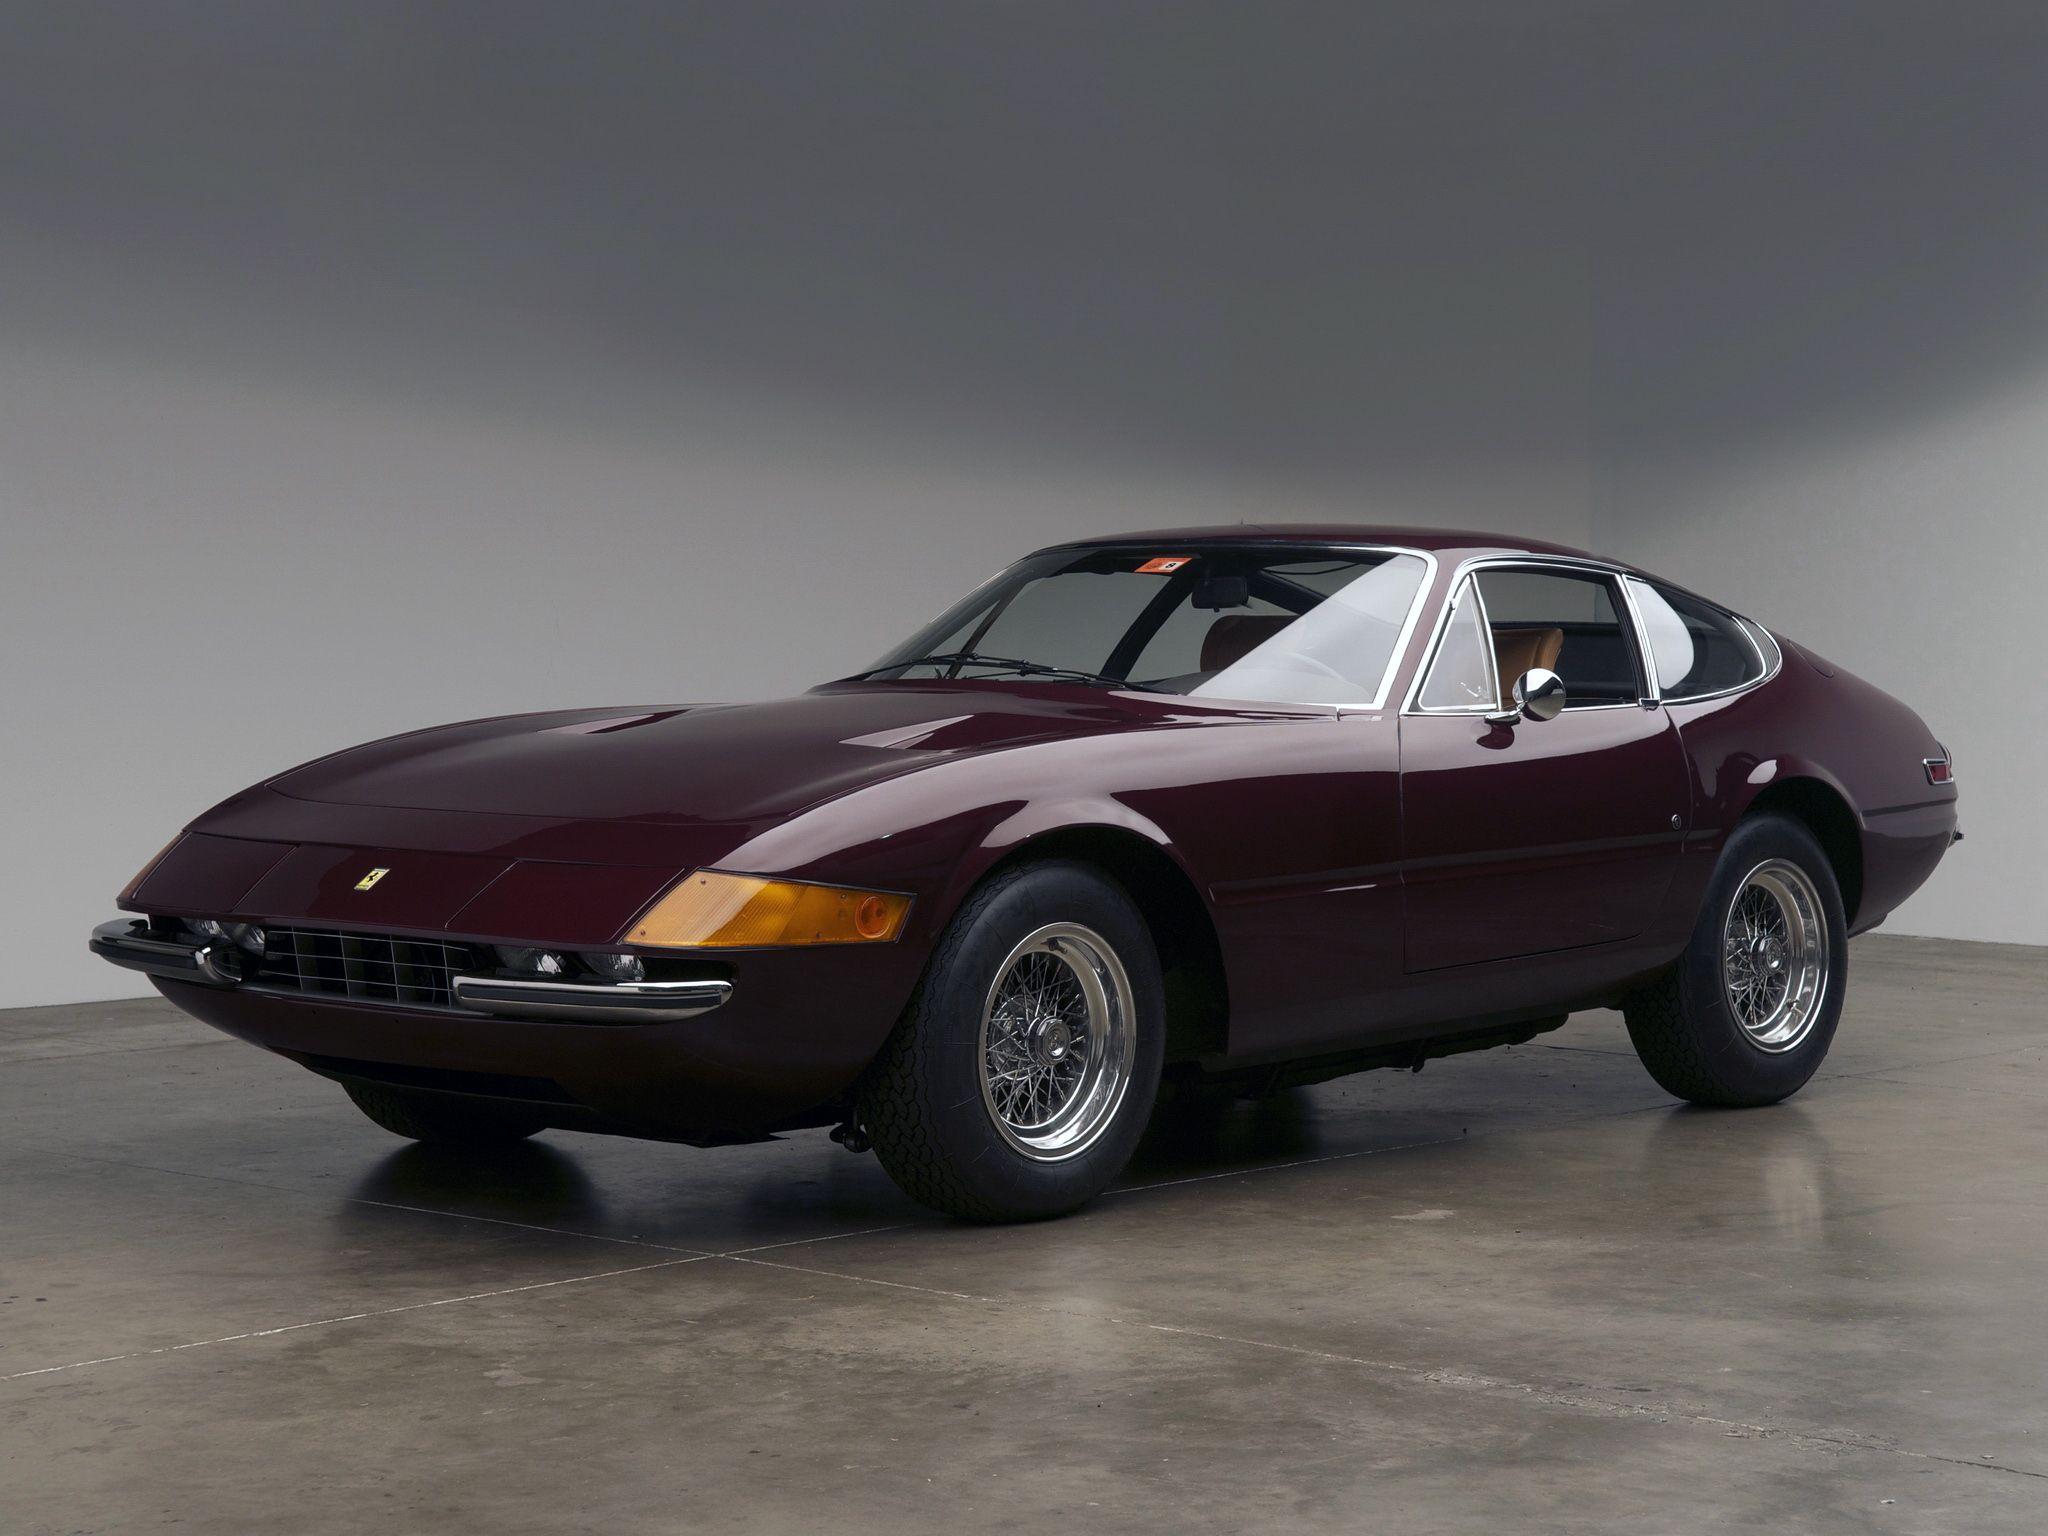 Ferrari 365 gtc by pininfarina 1969 cars dashboards ferrari 365 gtc by pininfarina 1969 cars dashboards interiors pinterest ferrari salems lot and london vanachro Image collections